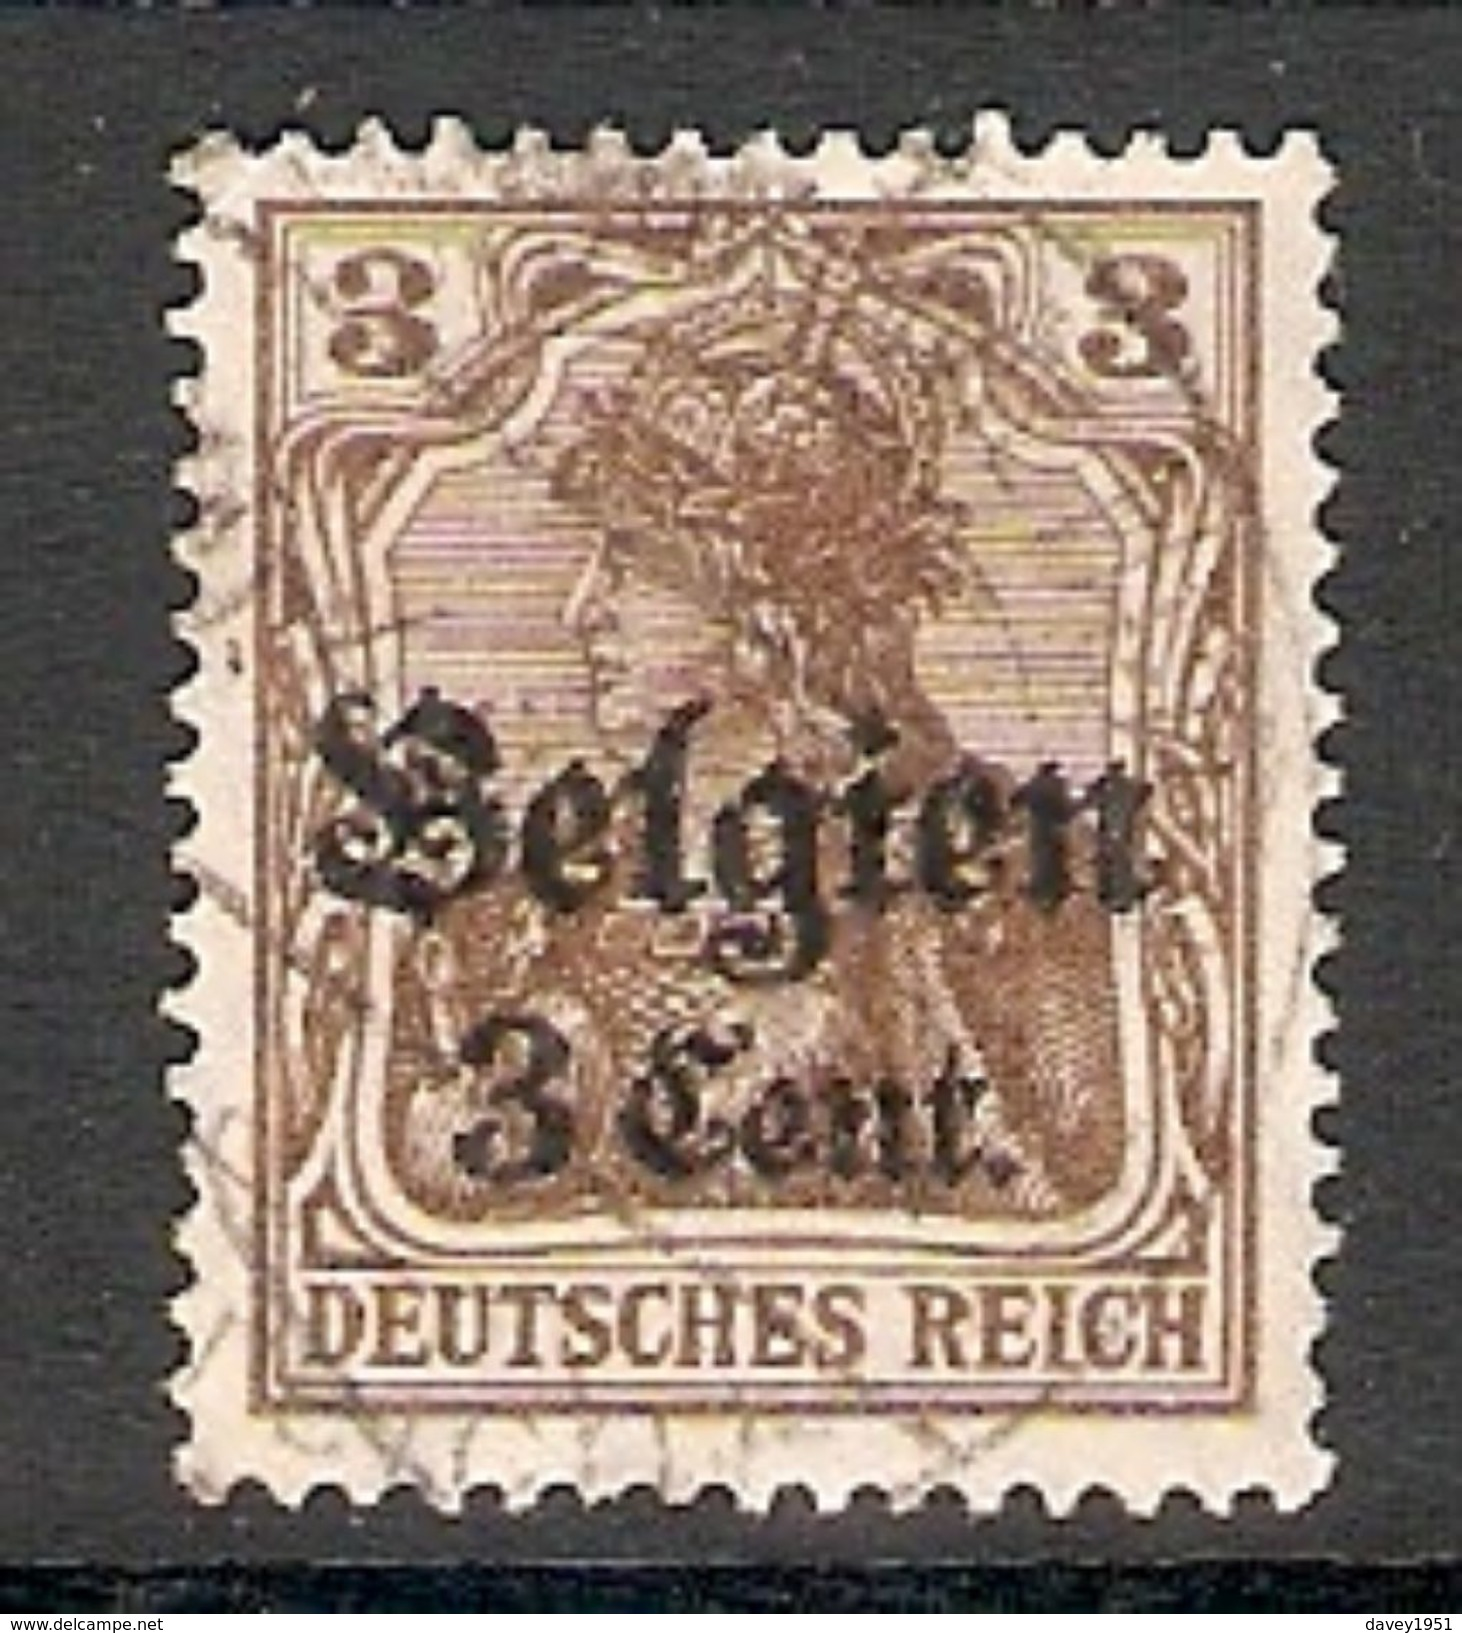 004828 Germany Occupation Of Belgium 1916 3c On 3pf FU - Zona Belga